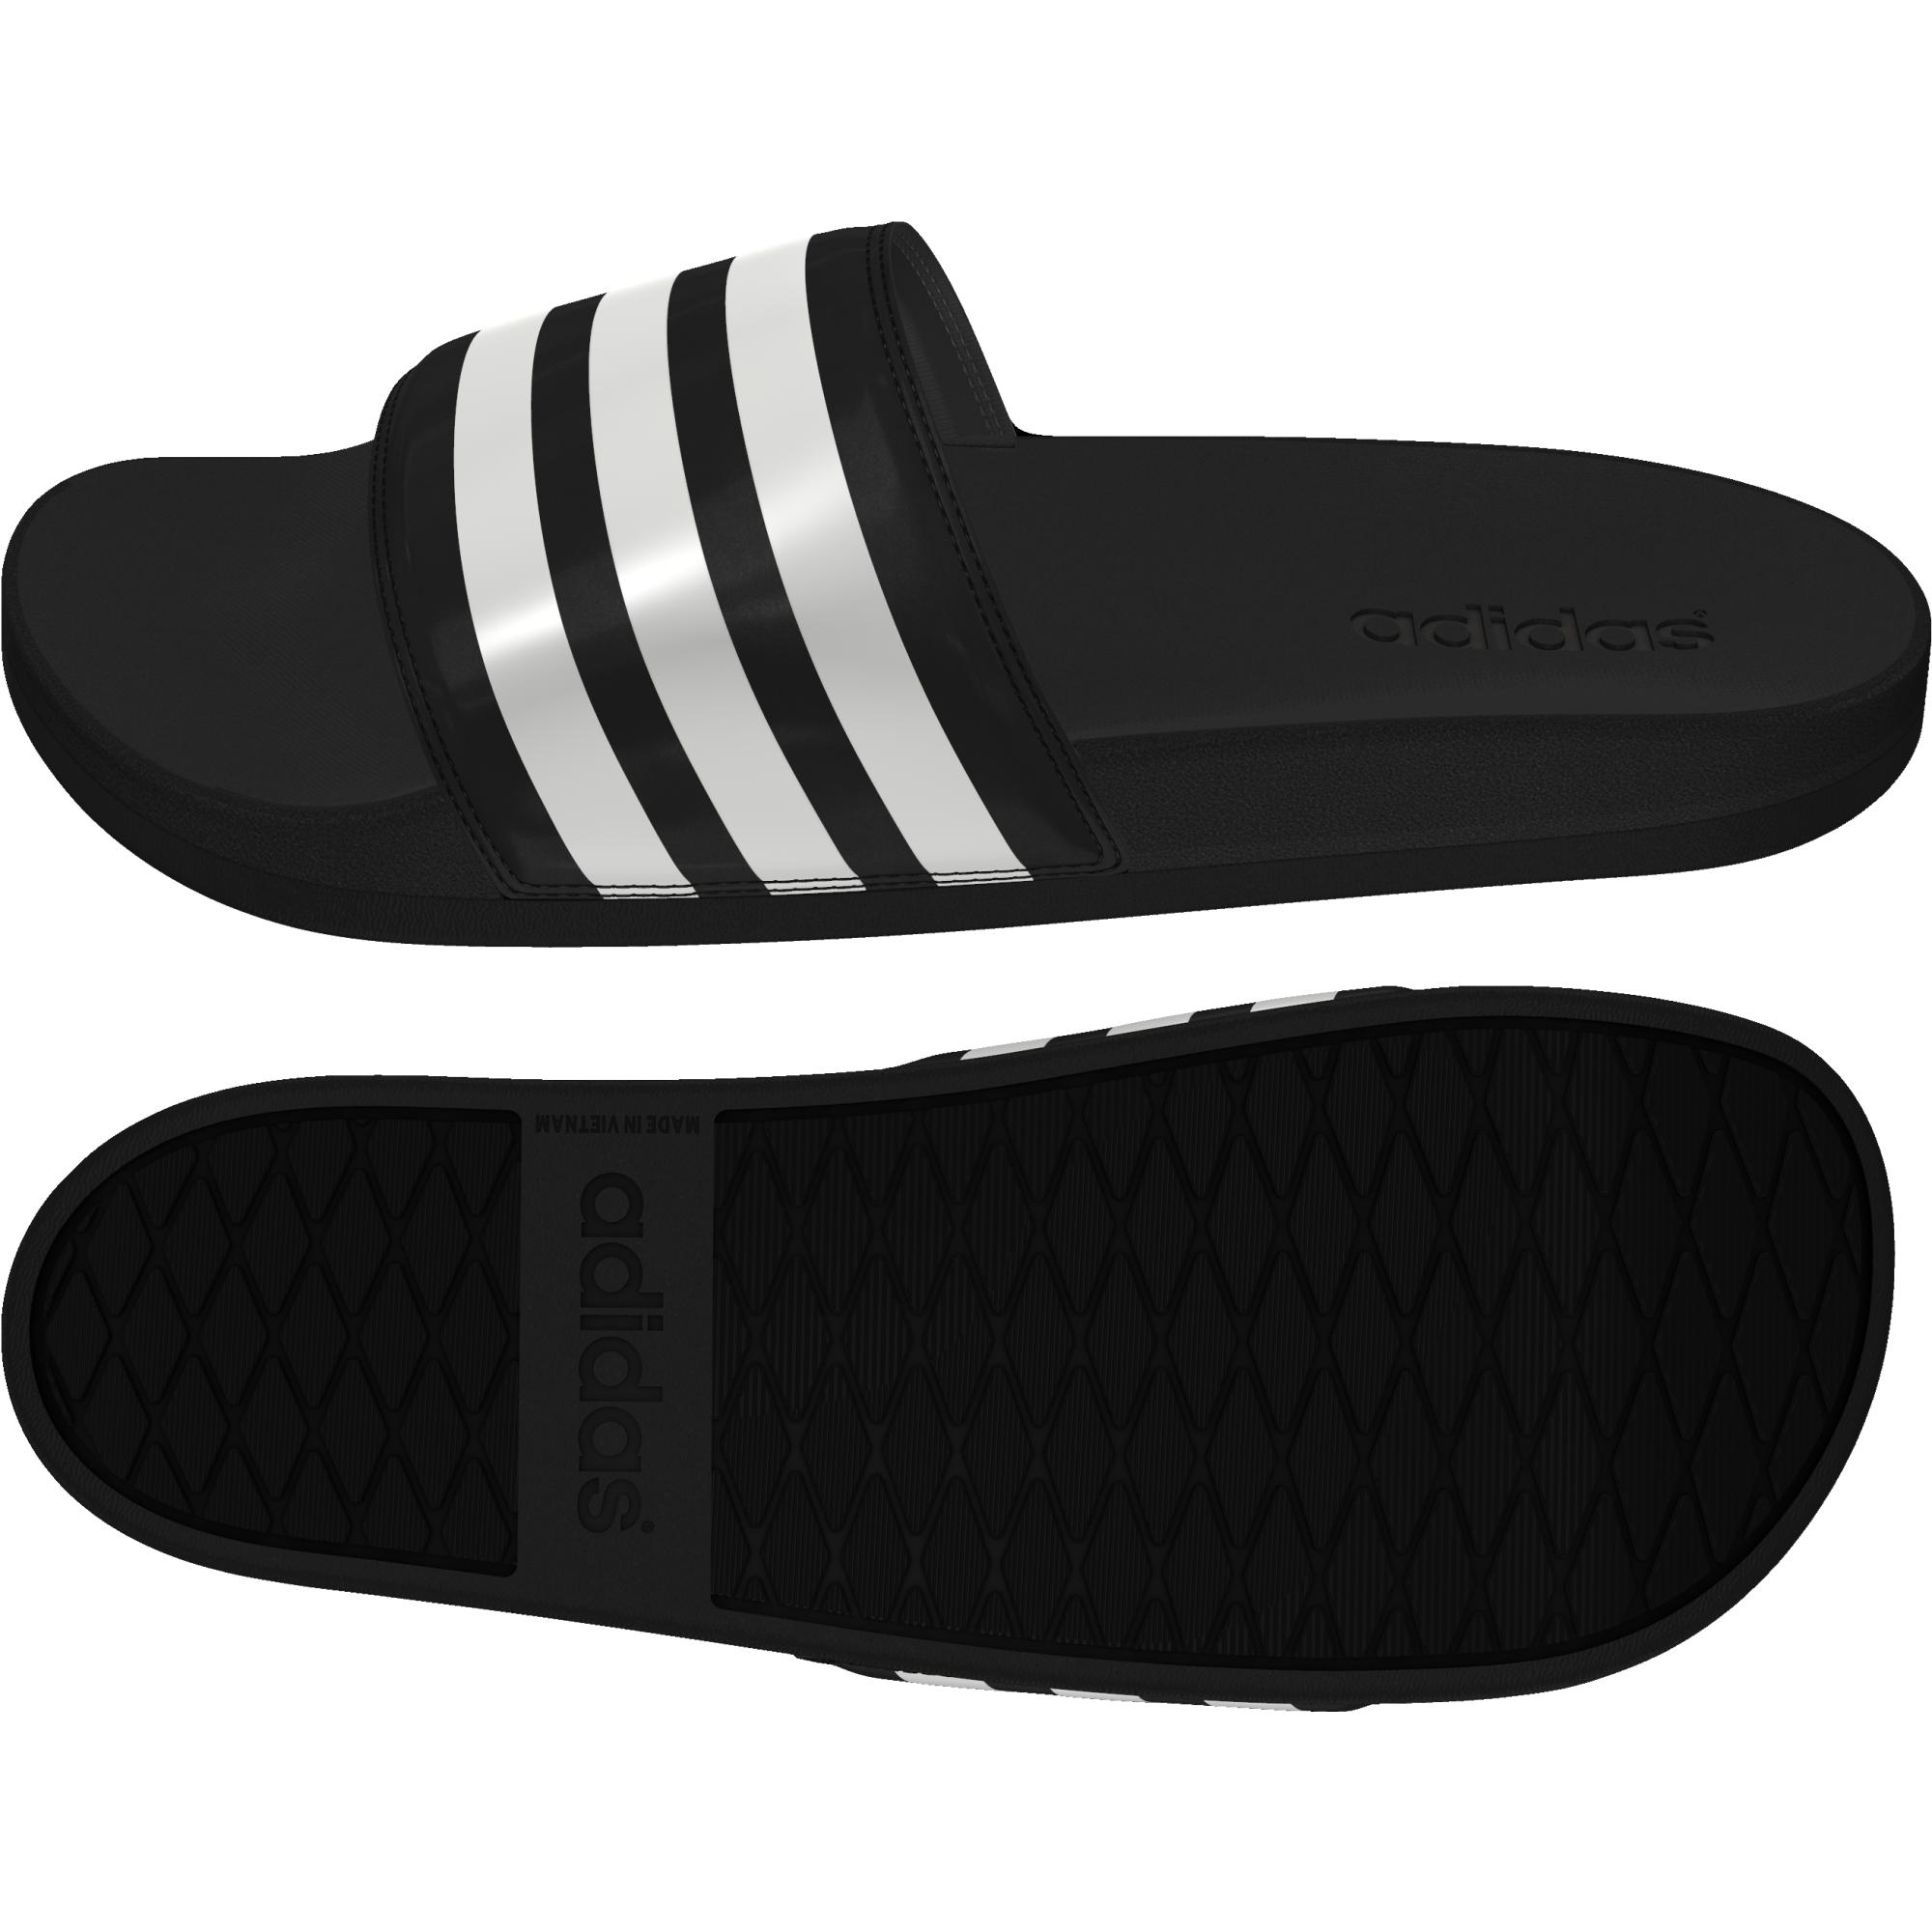 5c3cf632ee Adidas Adilette Cf Ultra férfi papucs , Férfi cipő | papucs ,  adidas_performance , Adidas Adilette Cf Ultra férfi papucs